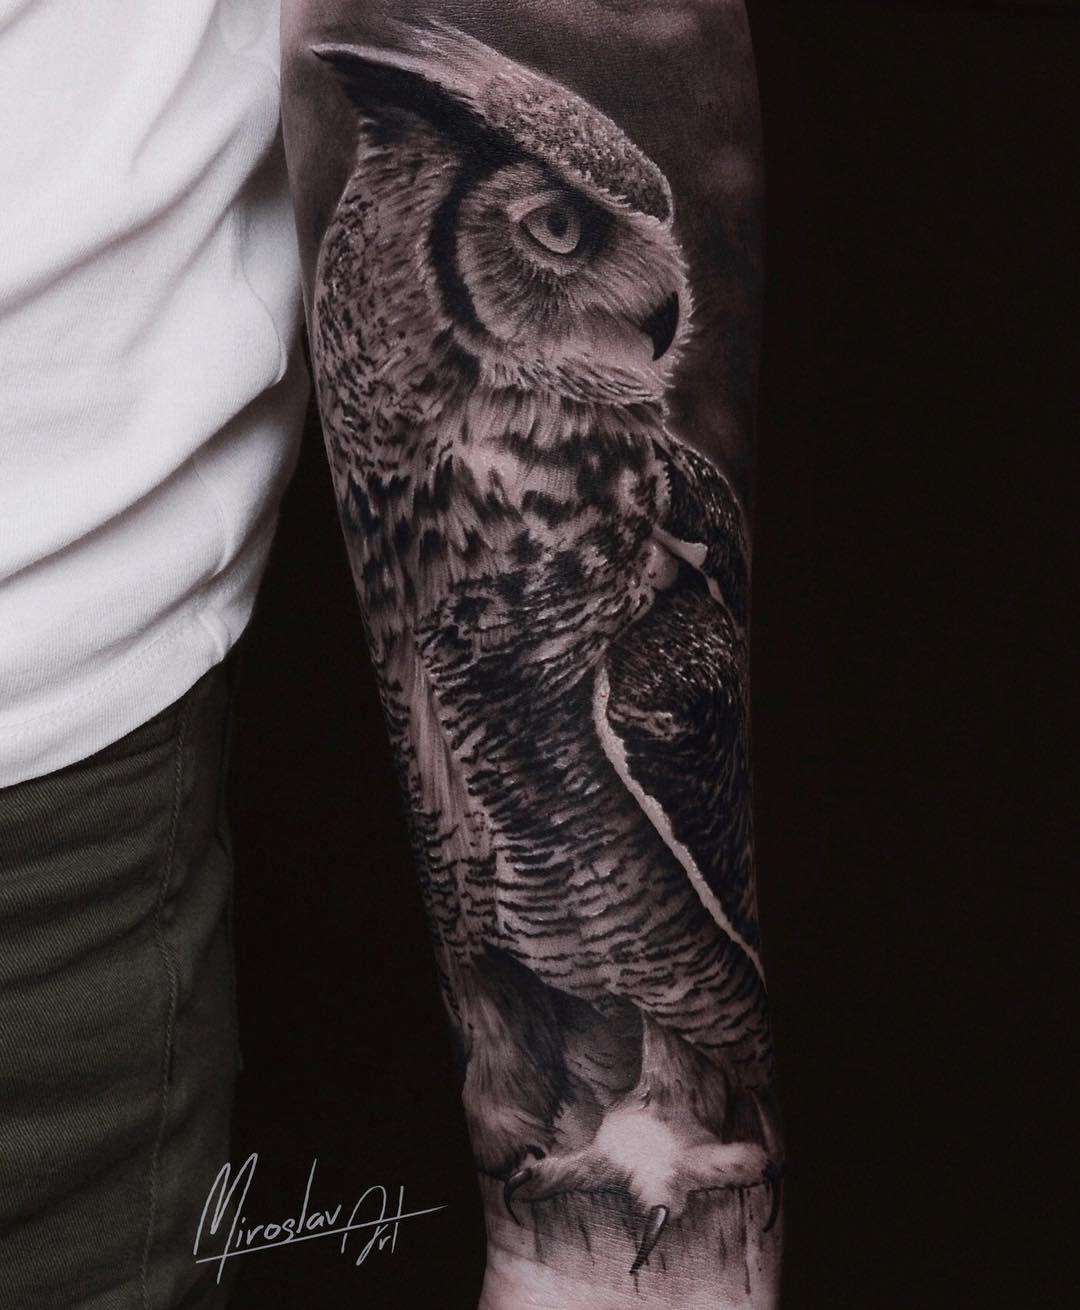 73 Best Owl Tattoos Design Ideas December 2020 Owl Tattoo Owl Tattoo Design Owl Tattoo Meaning